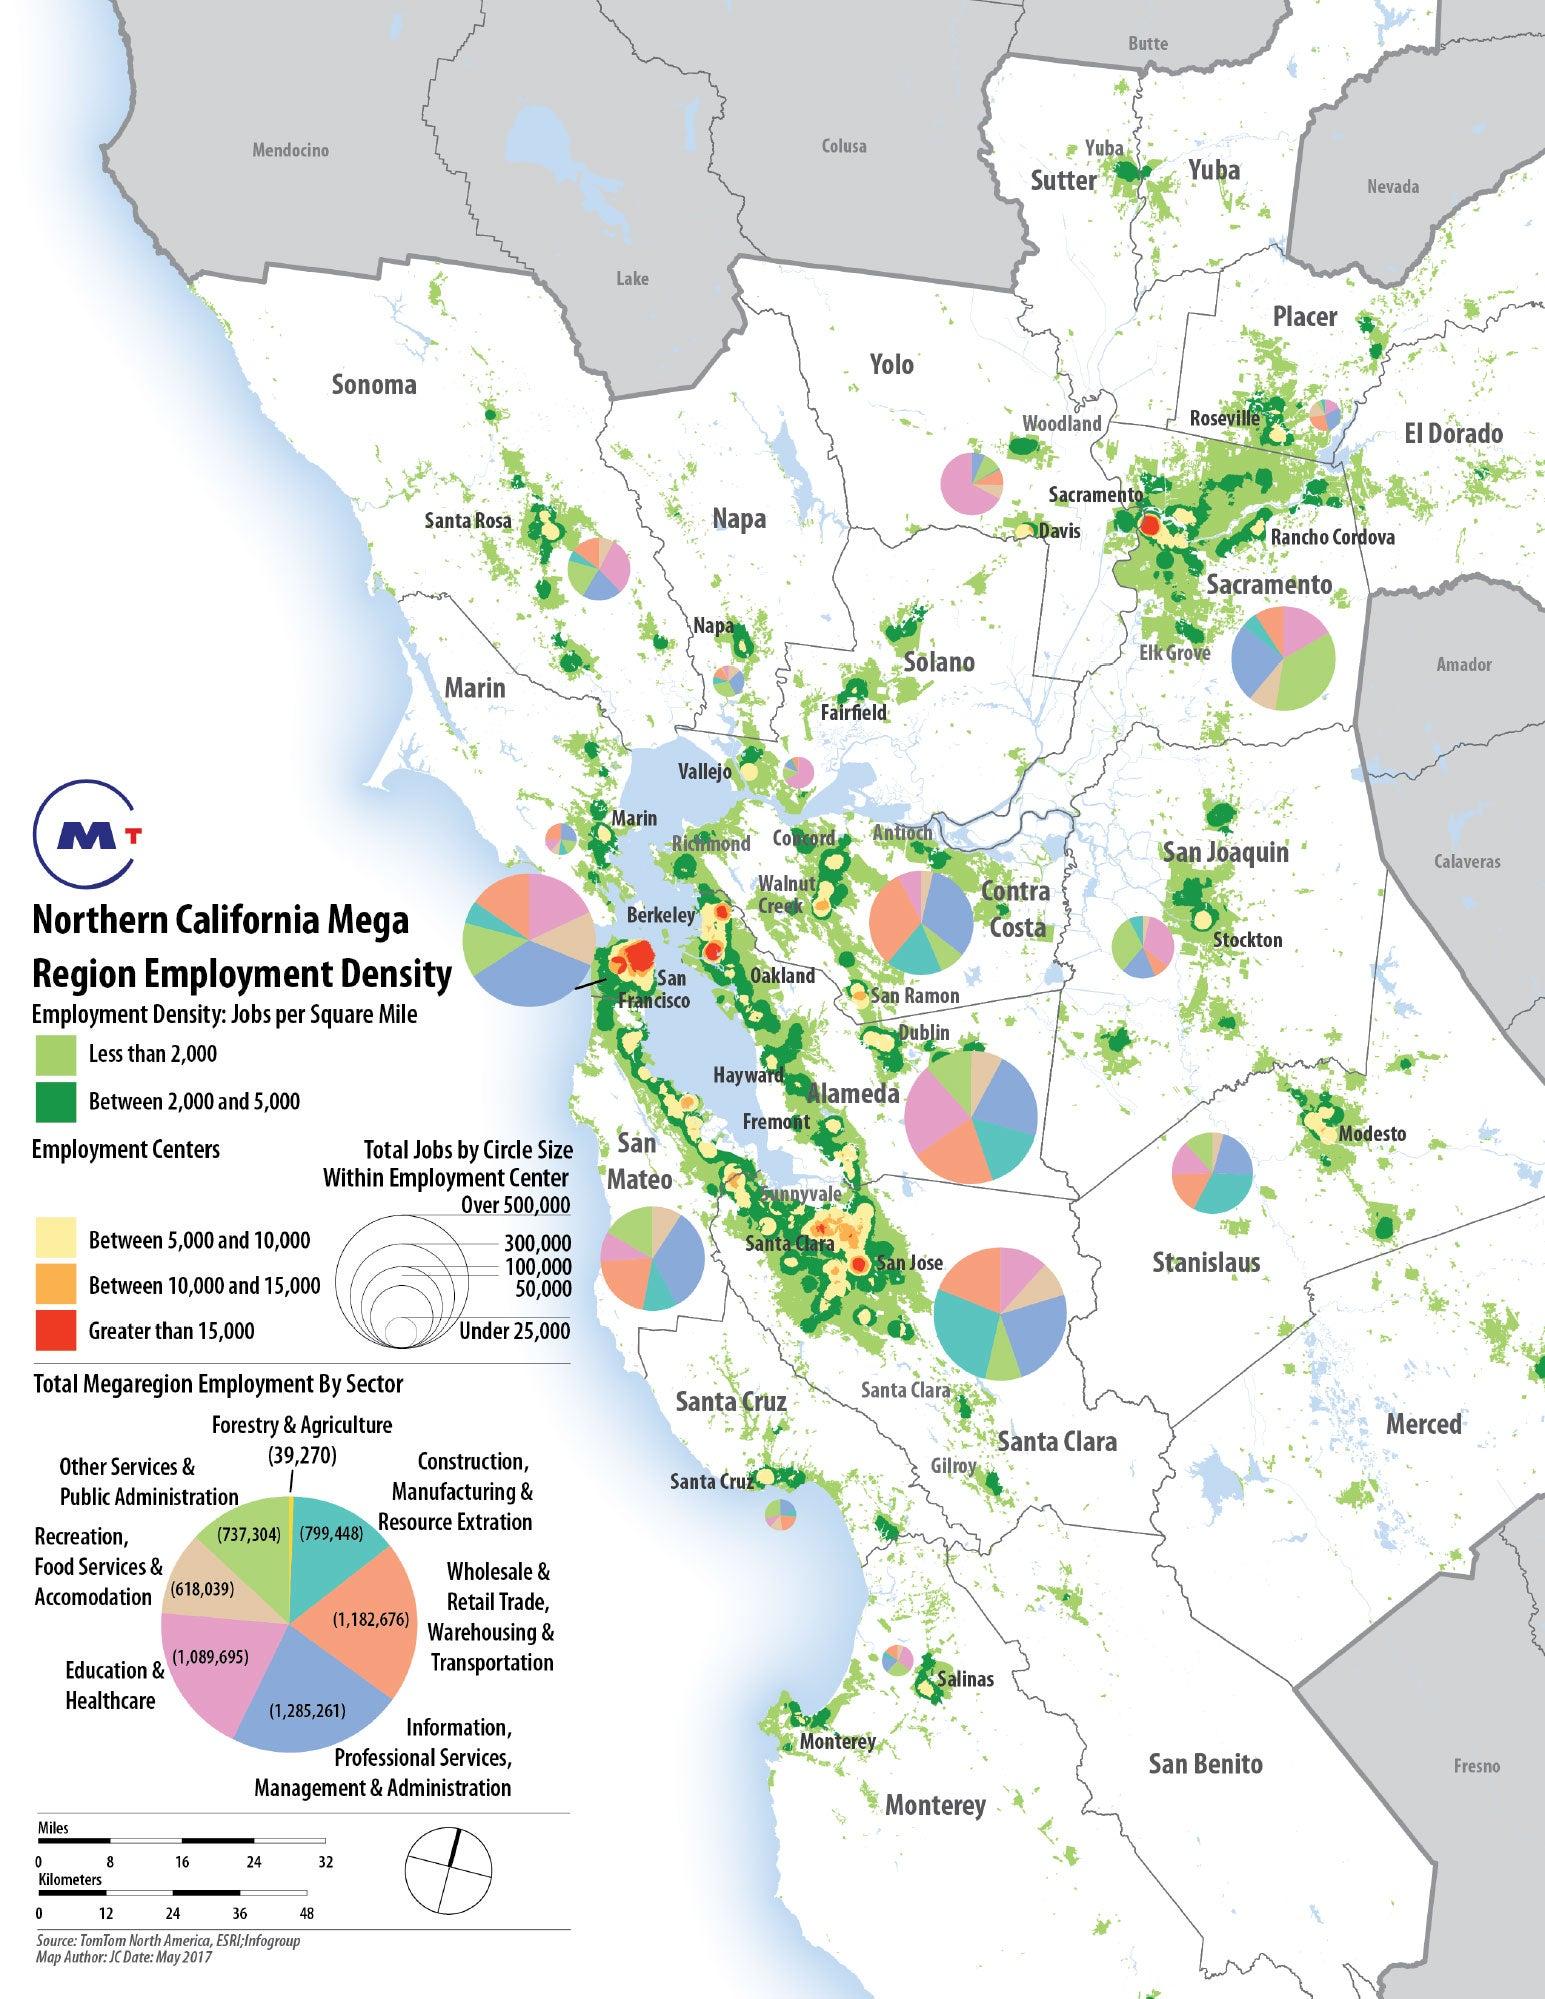 May 2017: Northern California Mega Region Employment Density